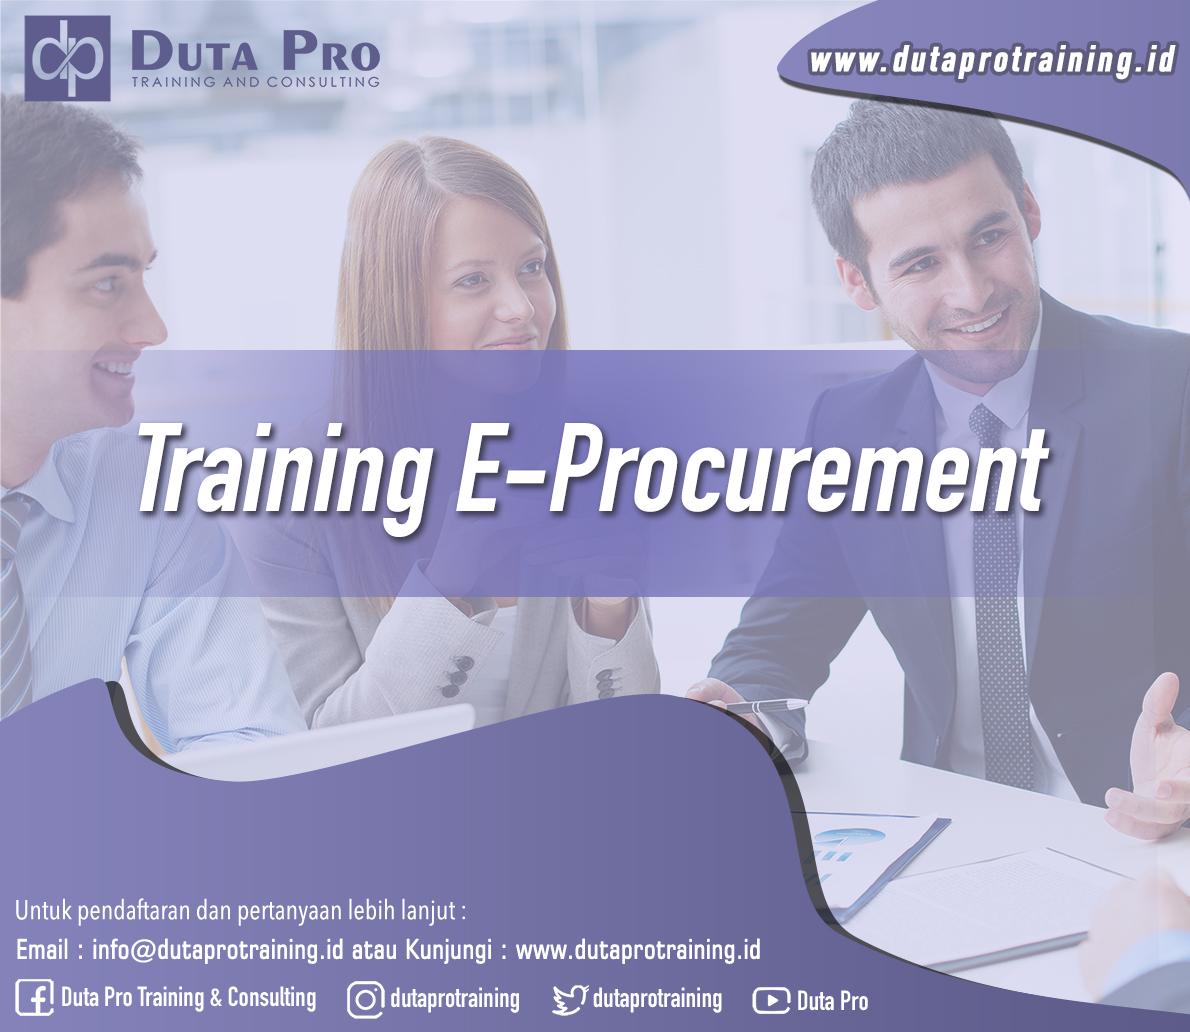 Training E-Procurement